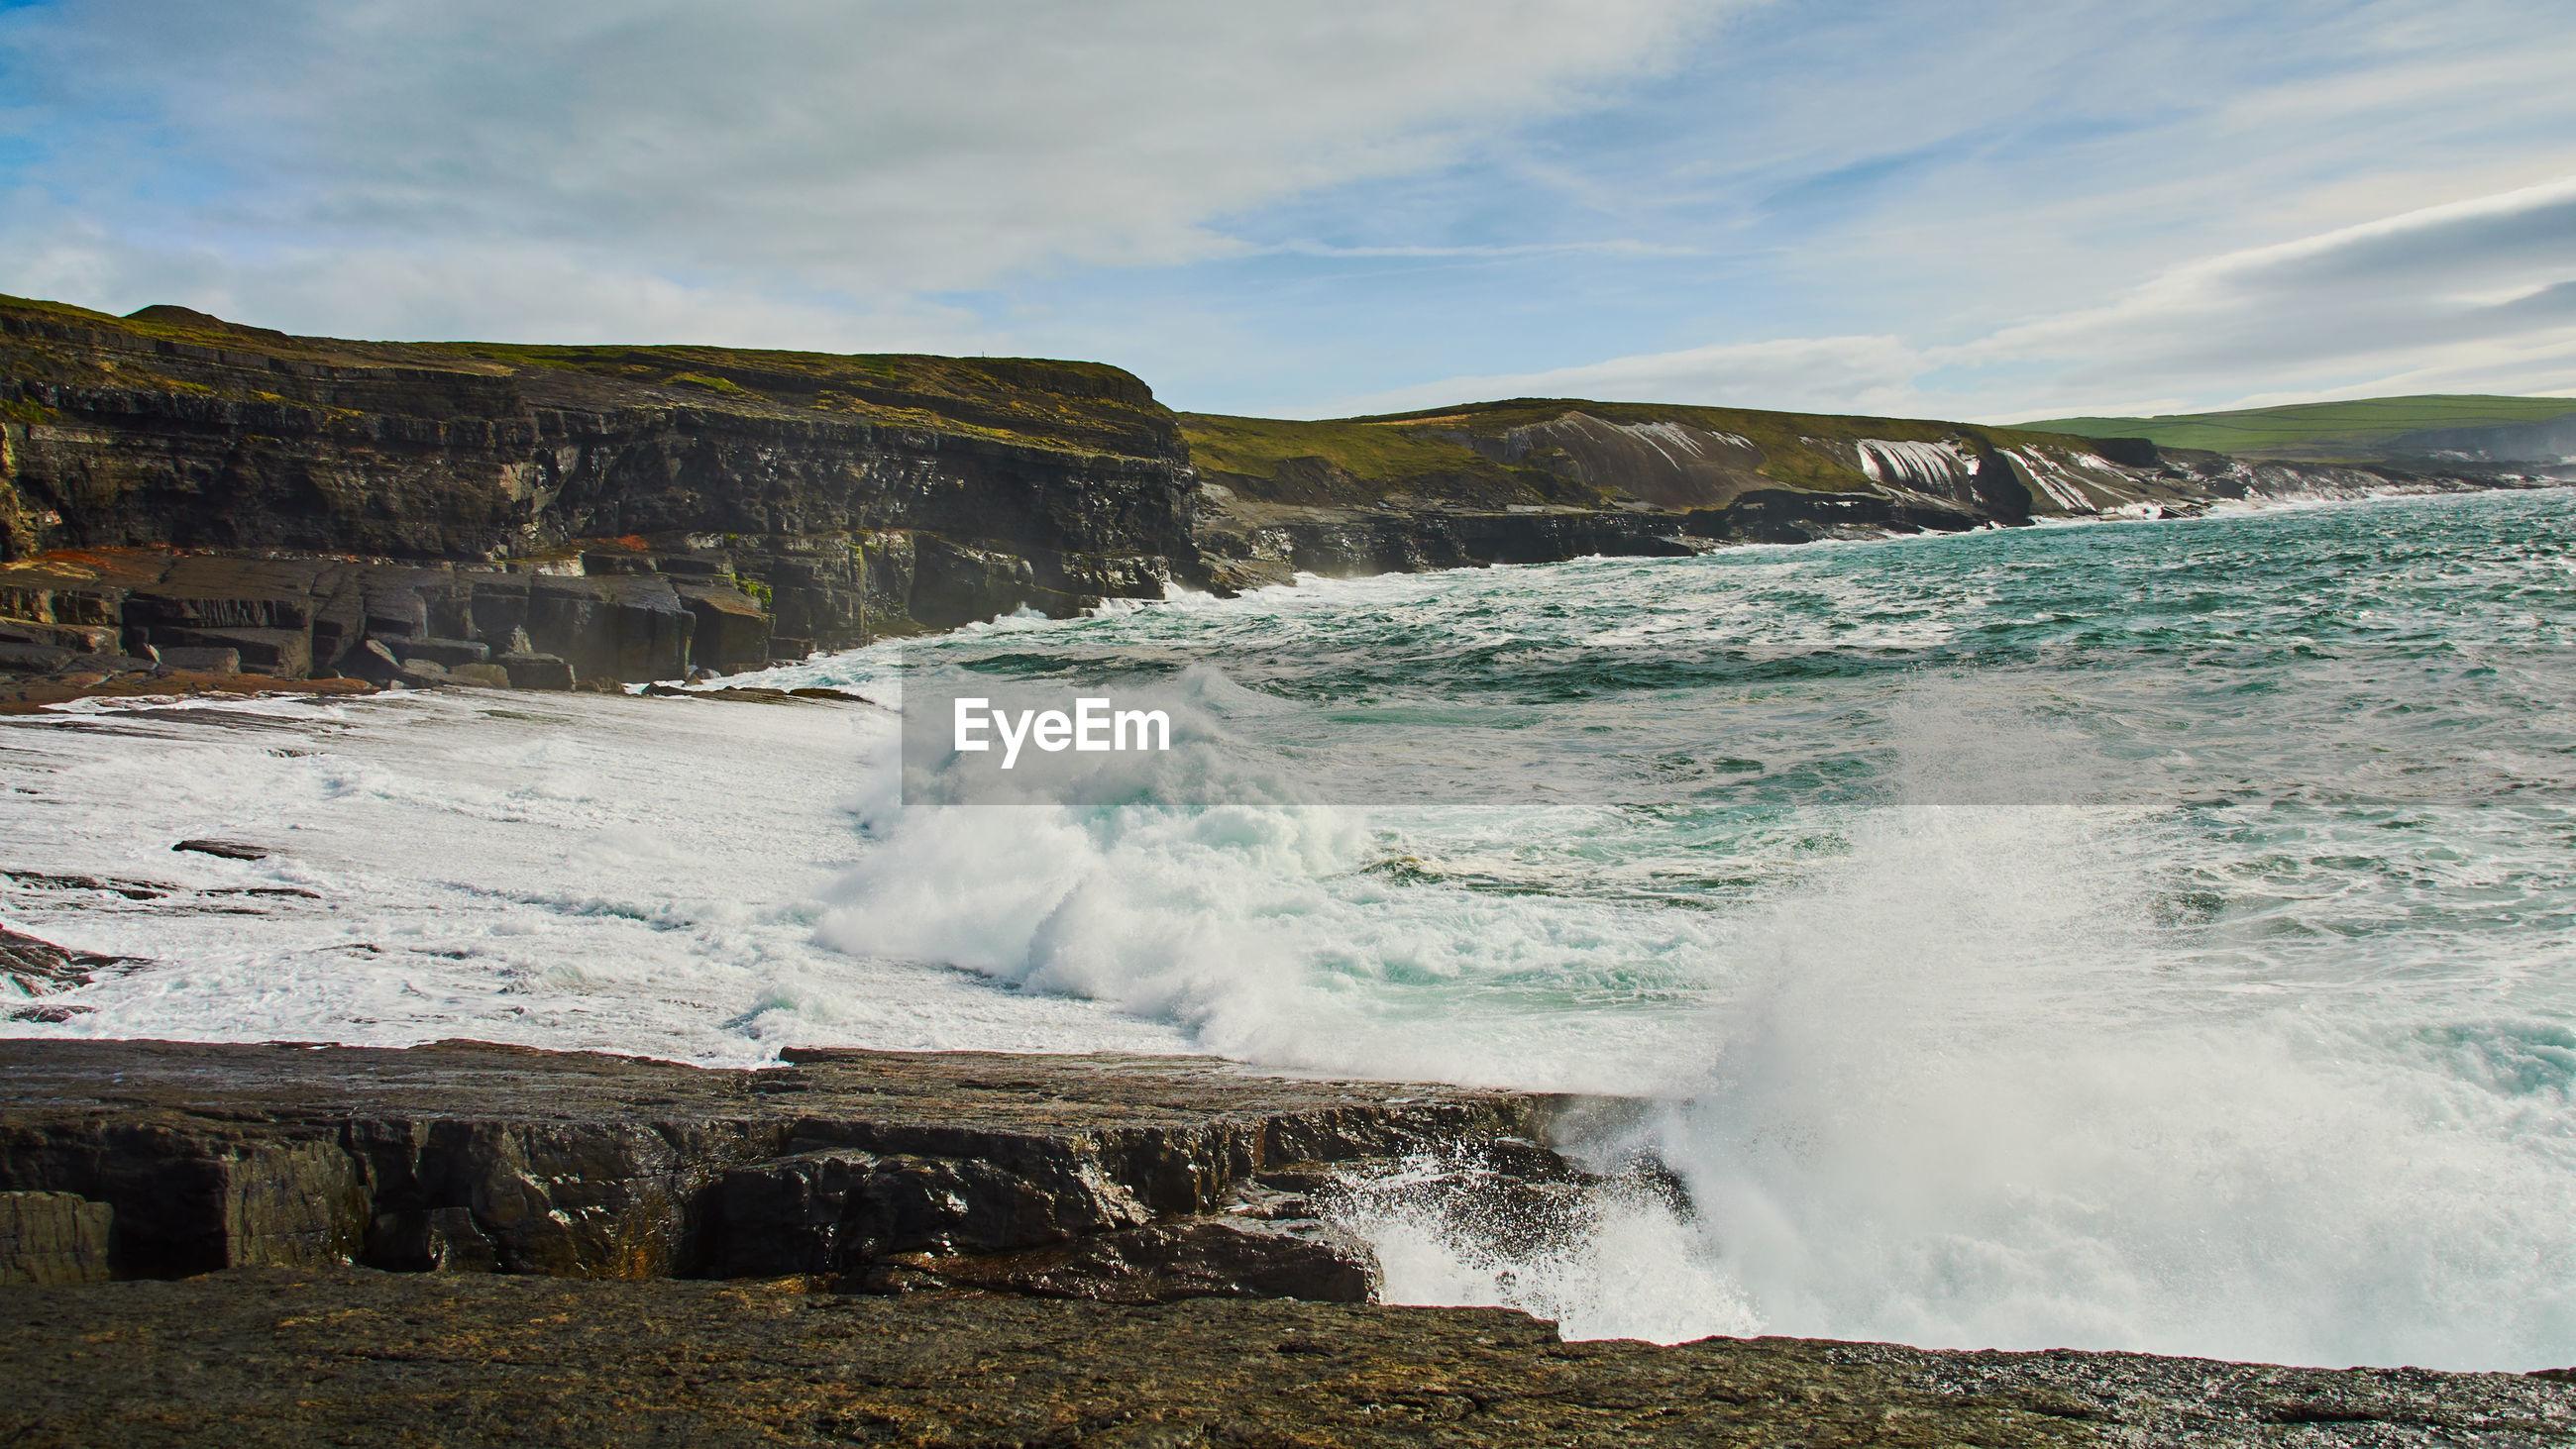 SCENIC VIEW OF WAVES SPLASHING ON SHORE